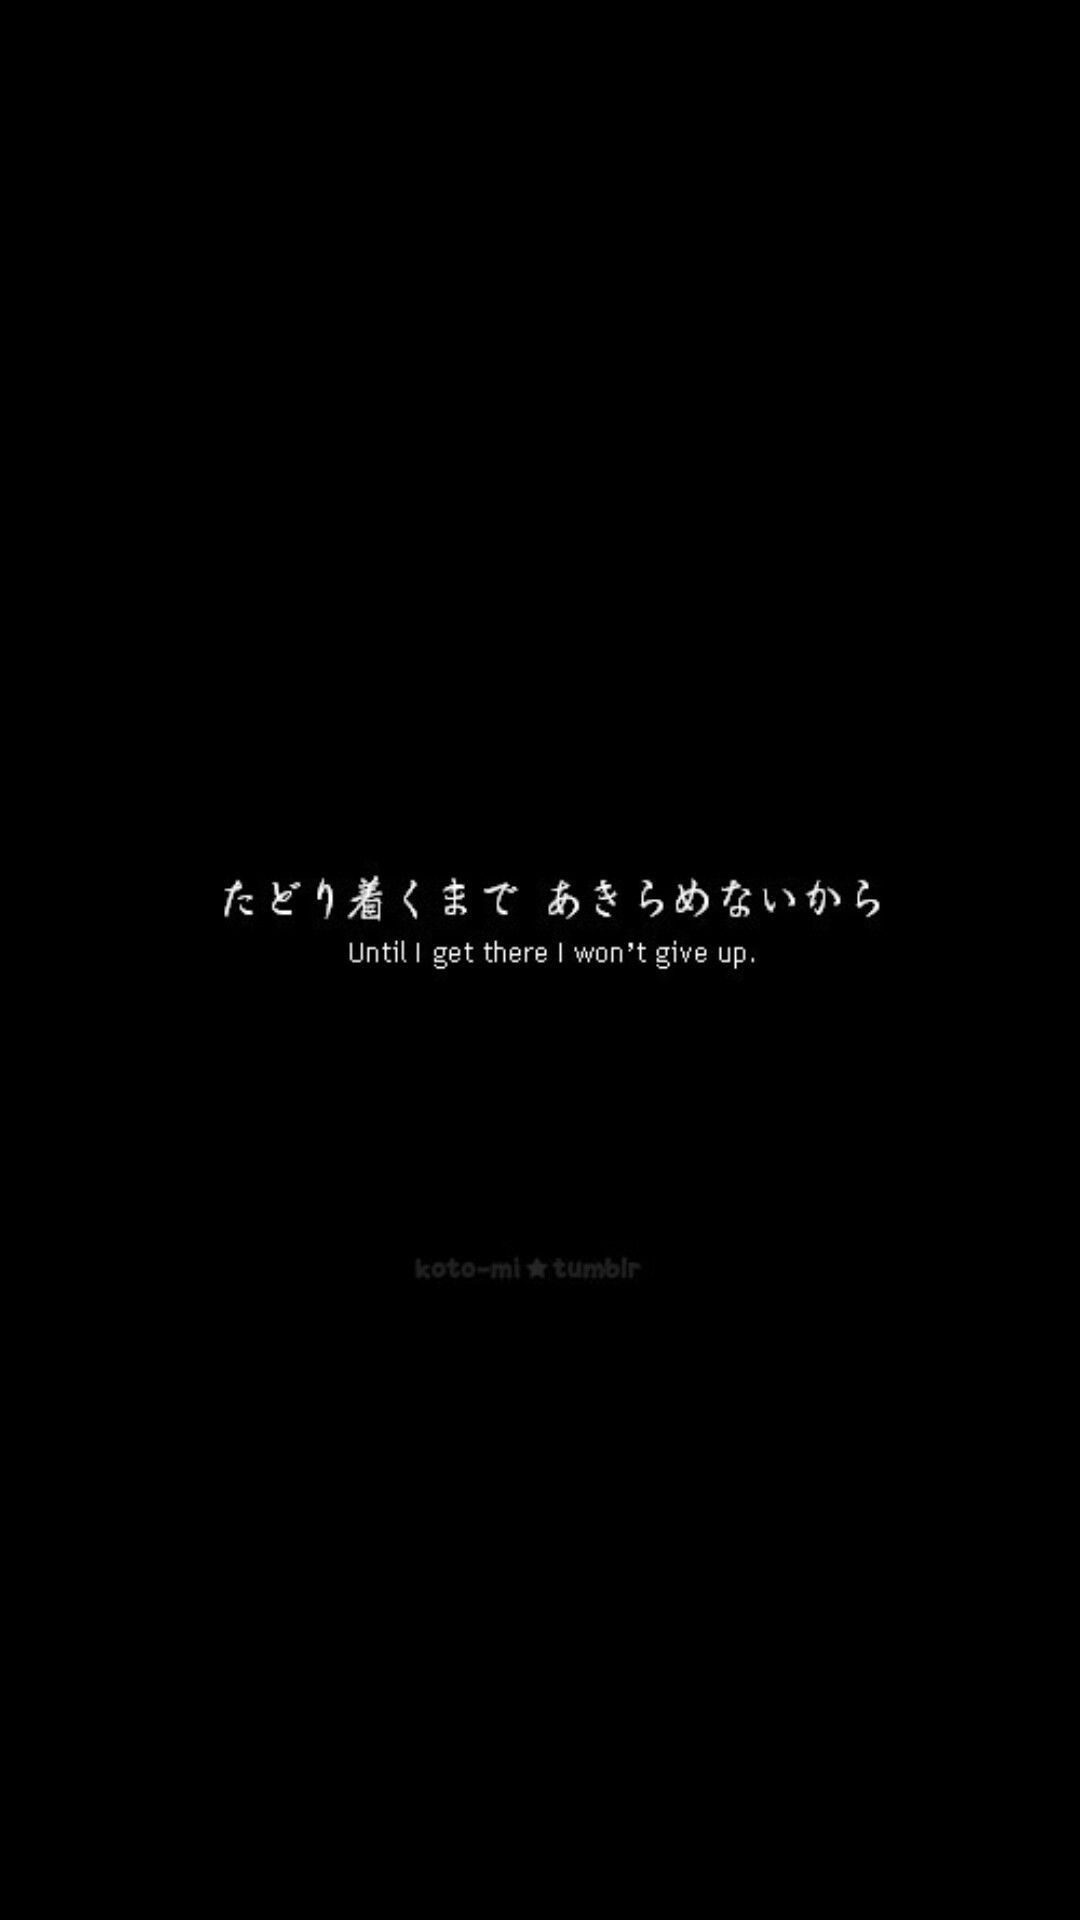 Iphone Wallpaper Tumblr Black 176 Japanese Quotes Words Wallpaper Japanese Words